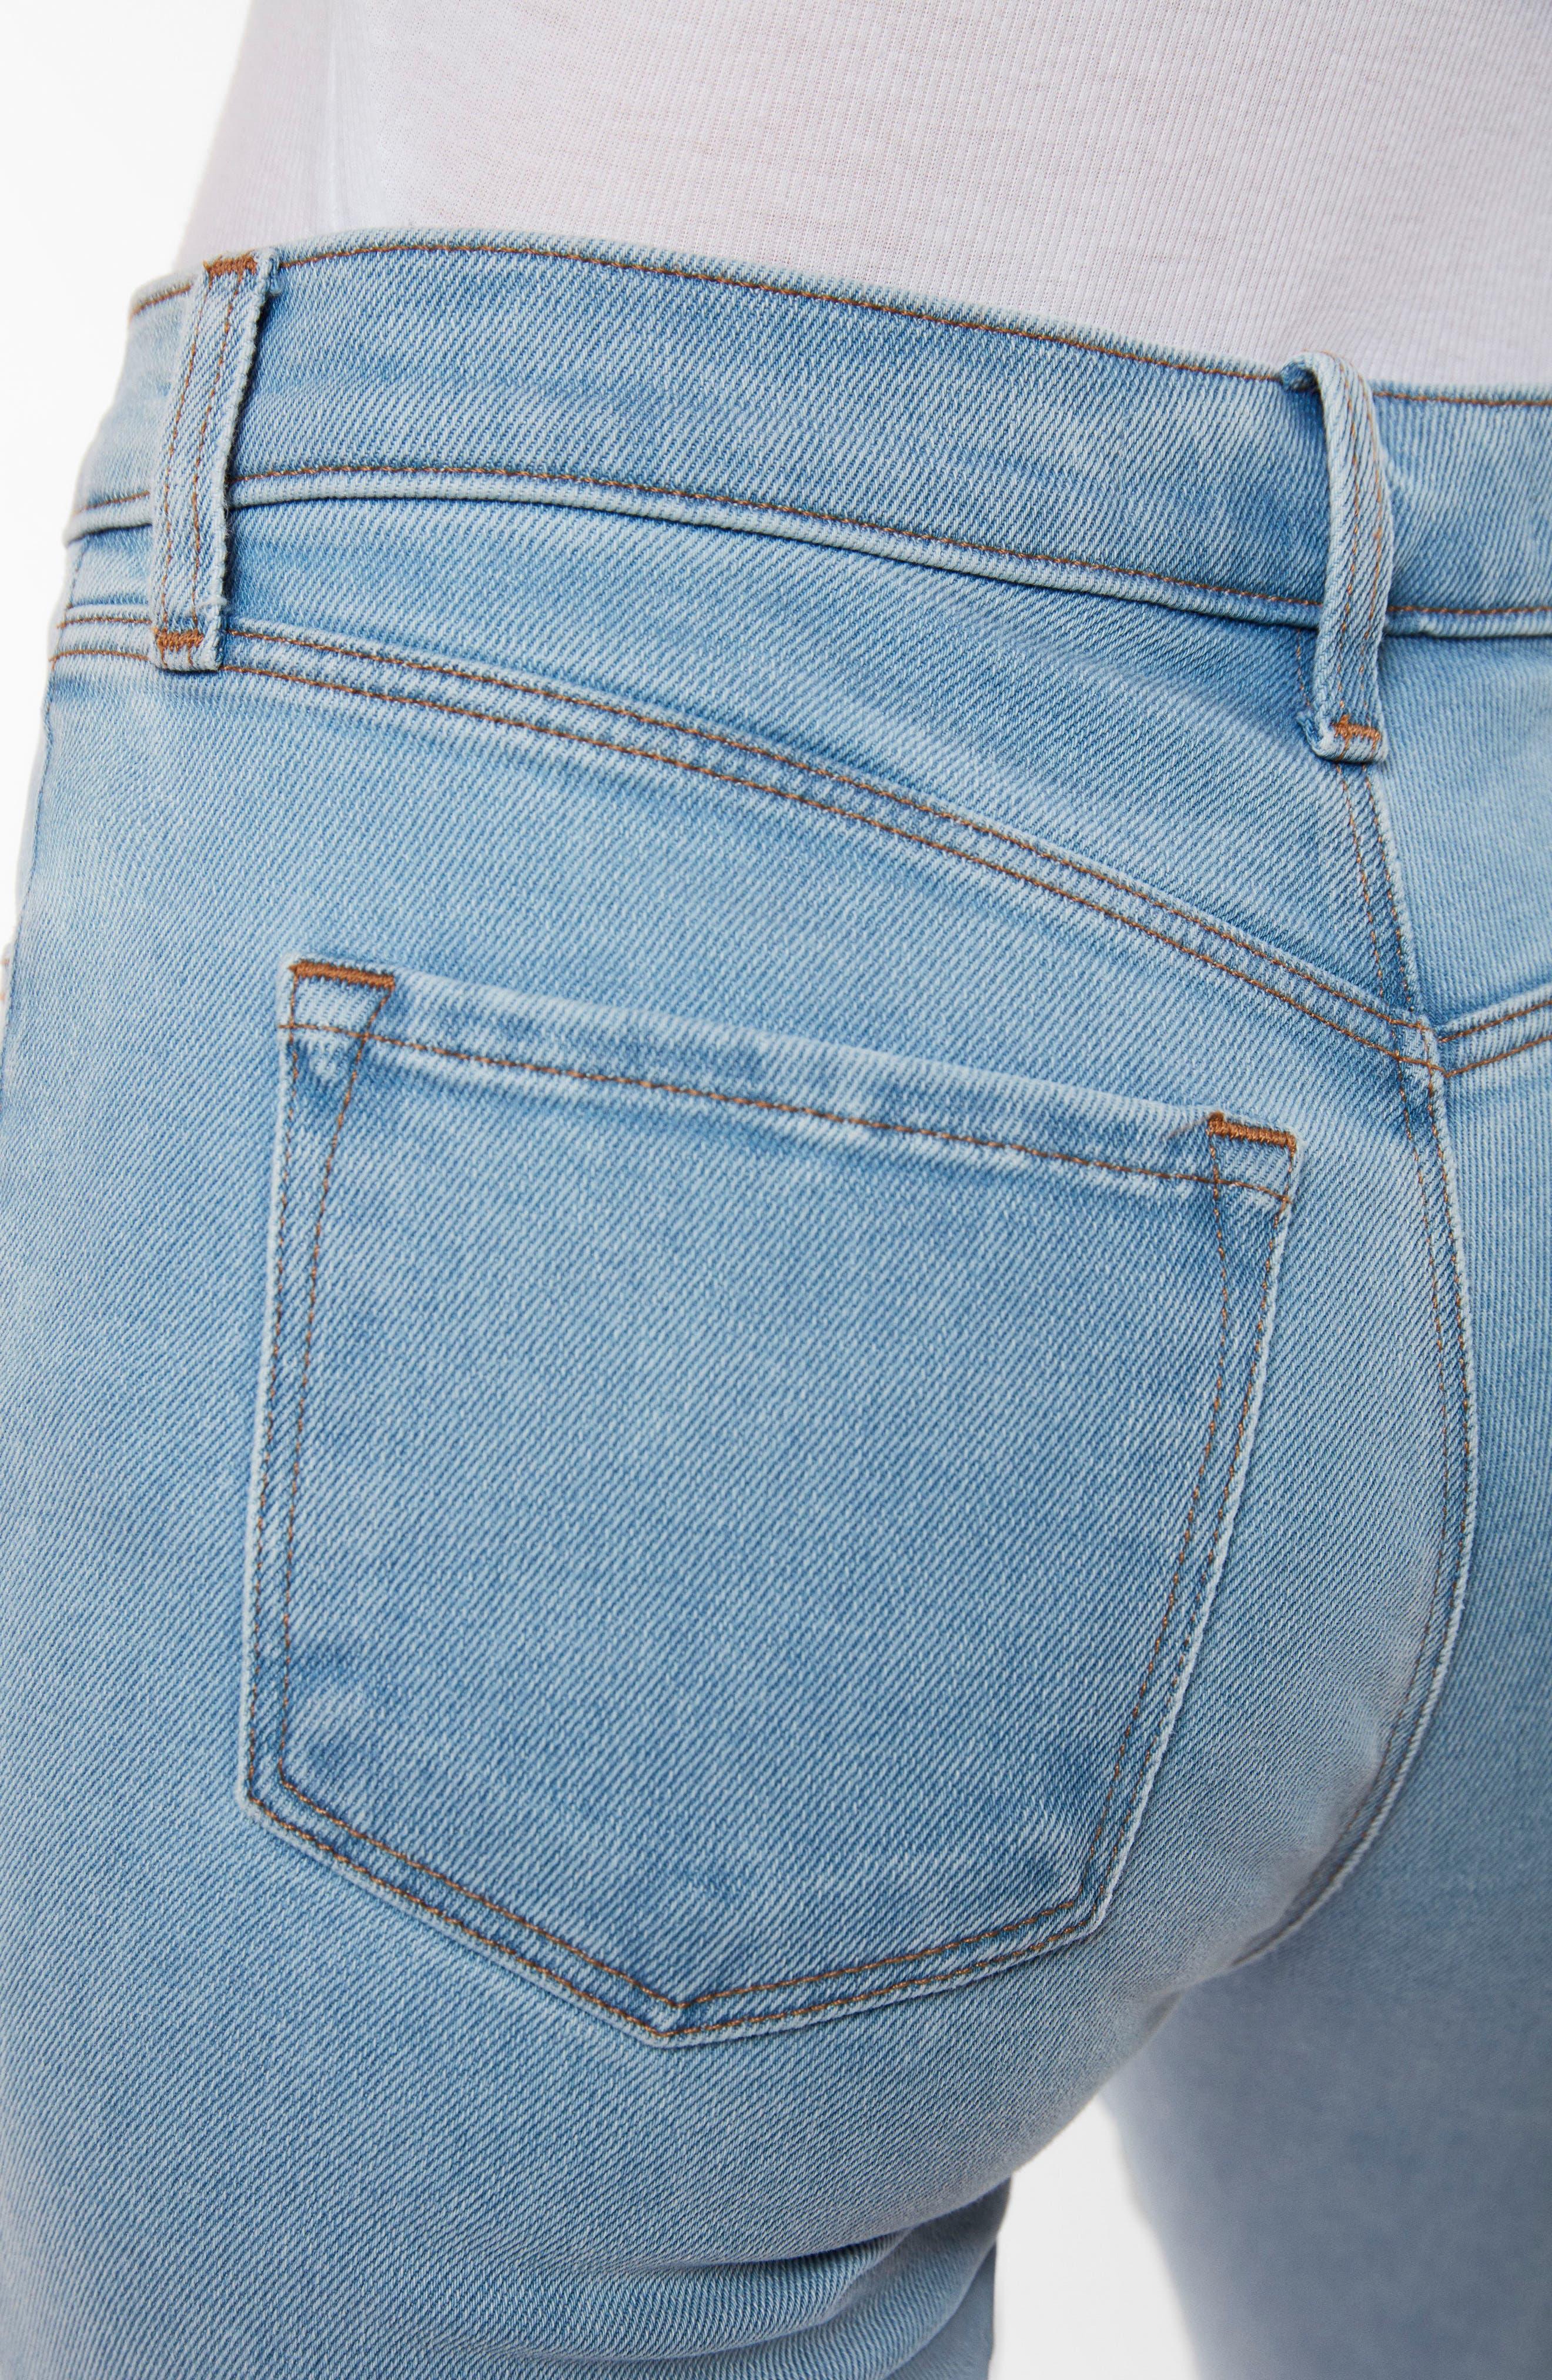 Ruby High Waist Crop Jeans,                             Alternate thumbnail 8, color,